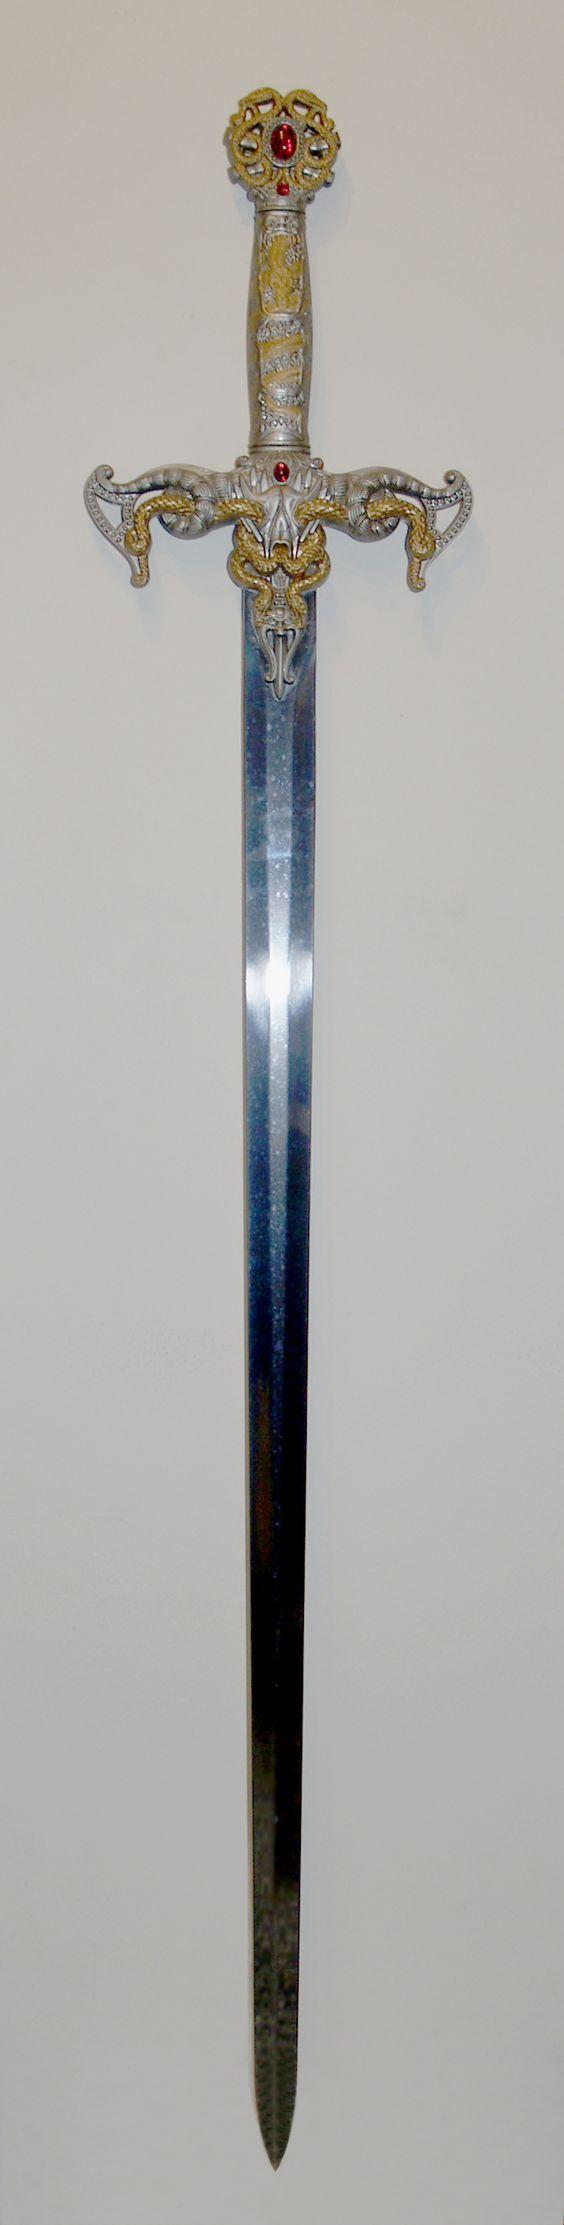 Fantasy Sword 3 by *Dracoart-Stock on deviantART